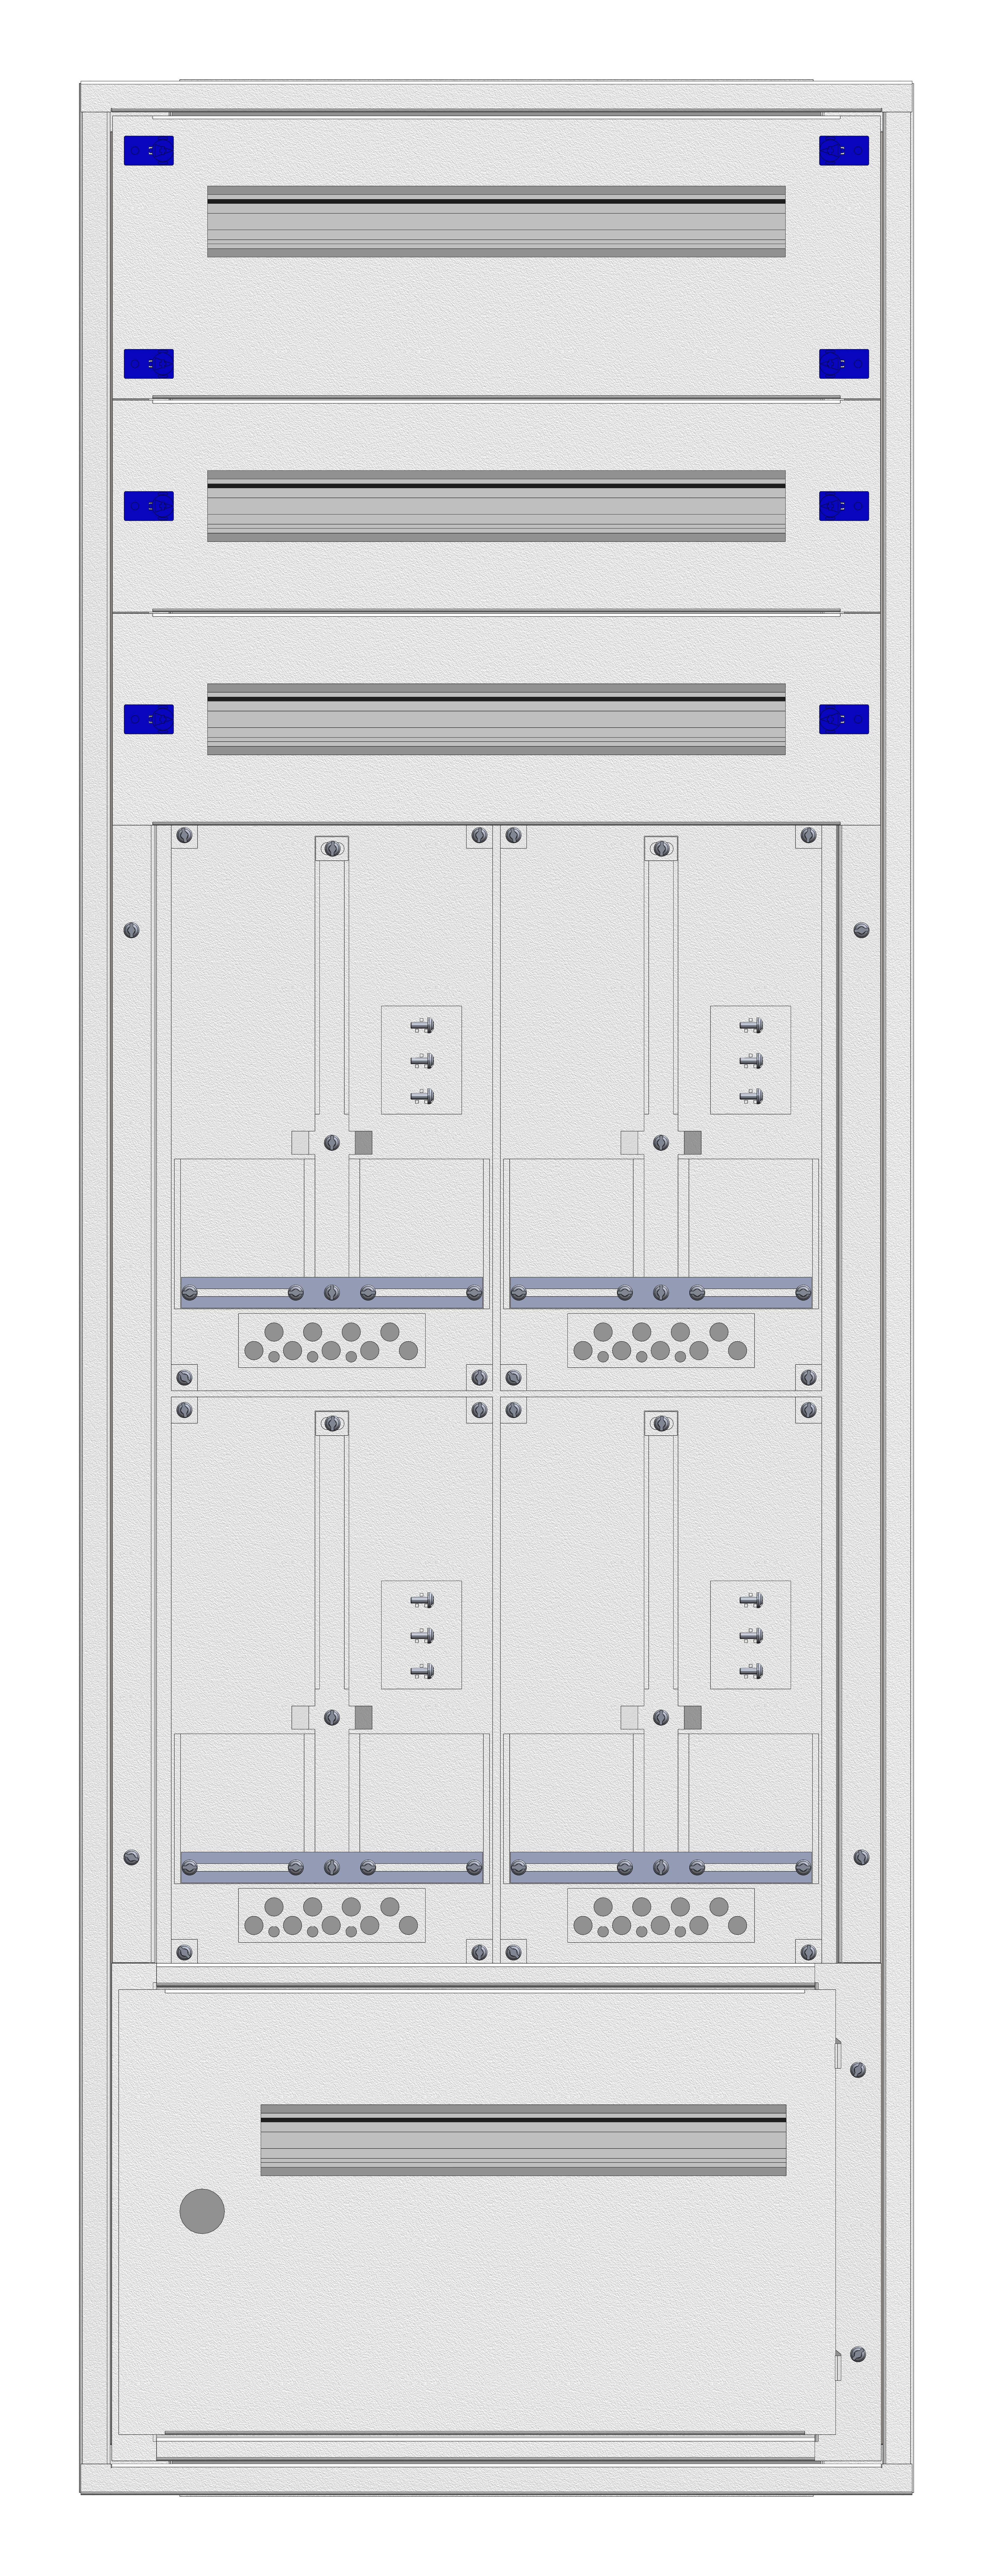 1 Stk Aufputz-Zählerverteiler 2A-33G/STMK 4ZP, H1605B590T250mm V1 IL162233GS